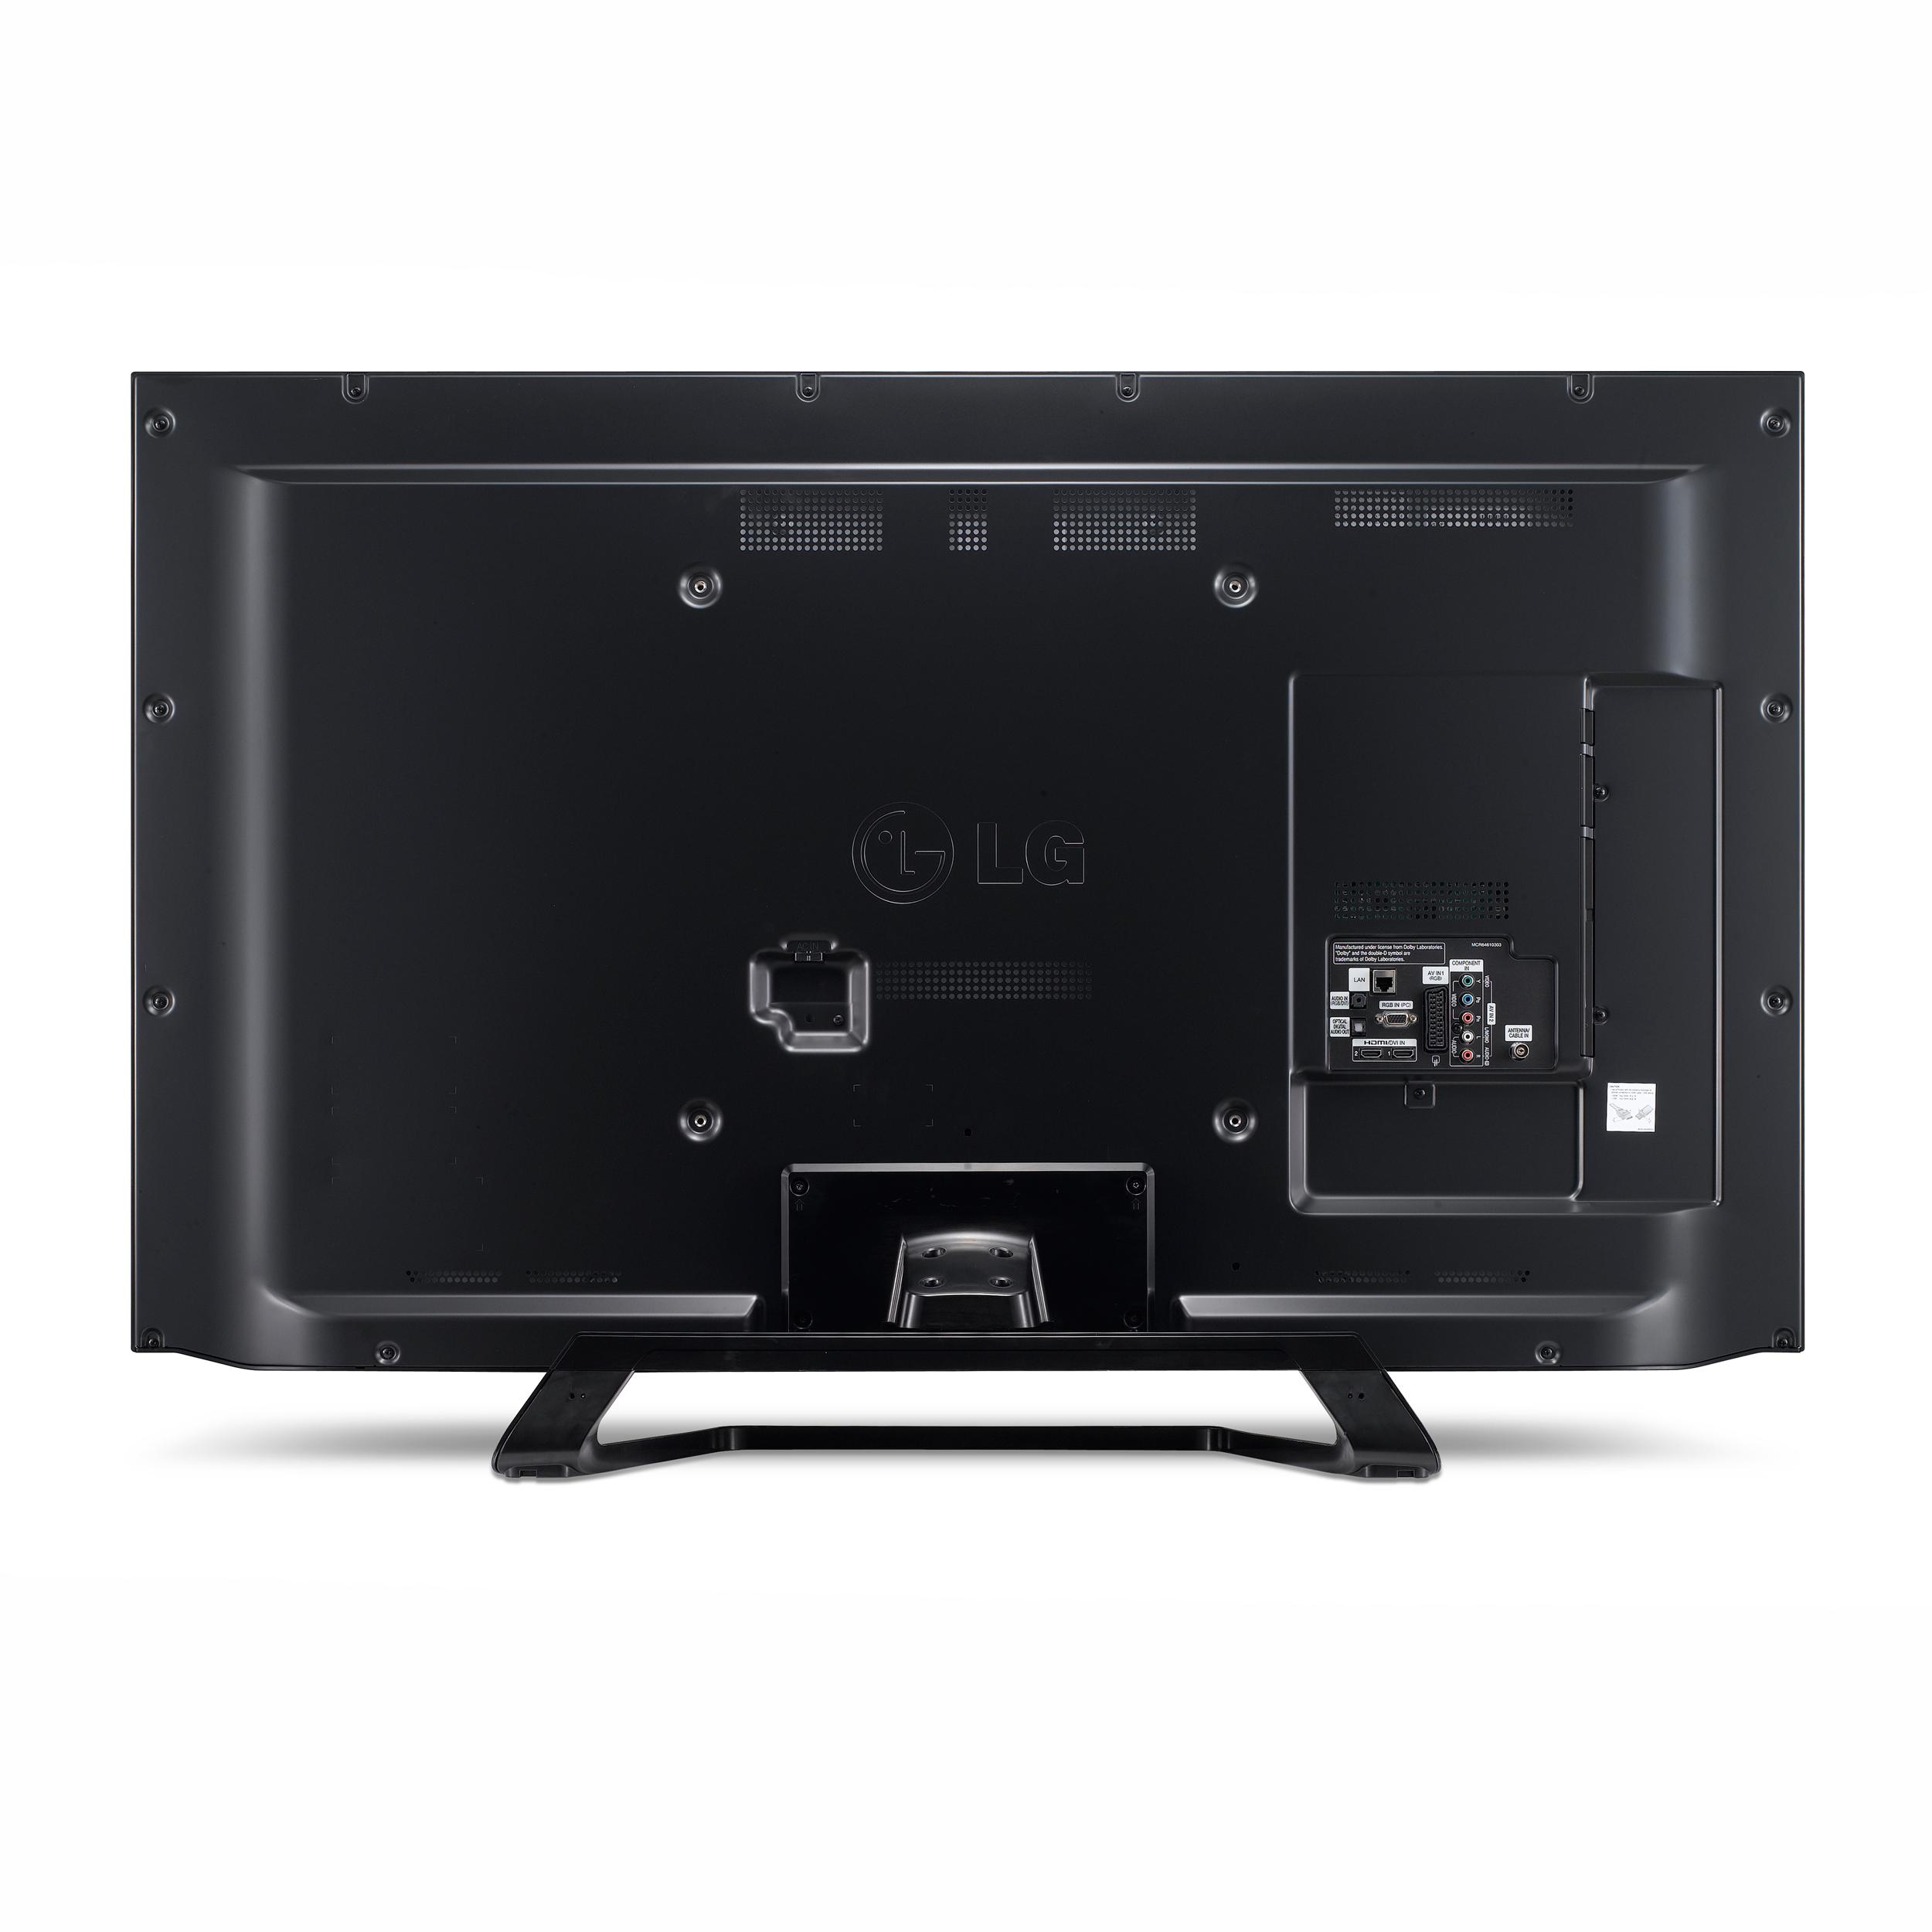 SAMSUNG HWE551 + 42 Inch 3D LED Television, LG 42-LM620